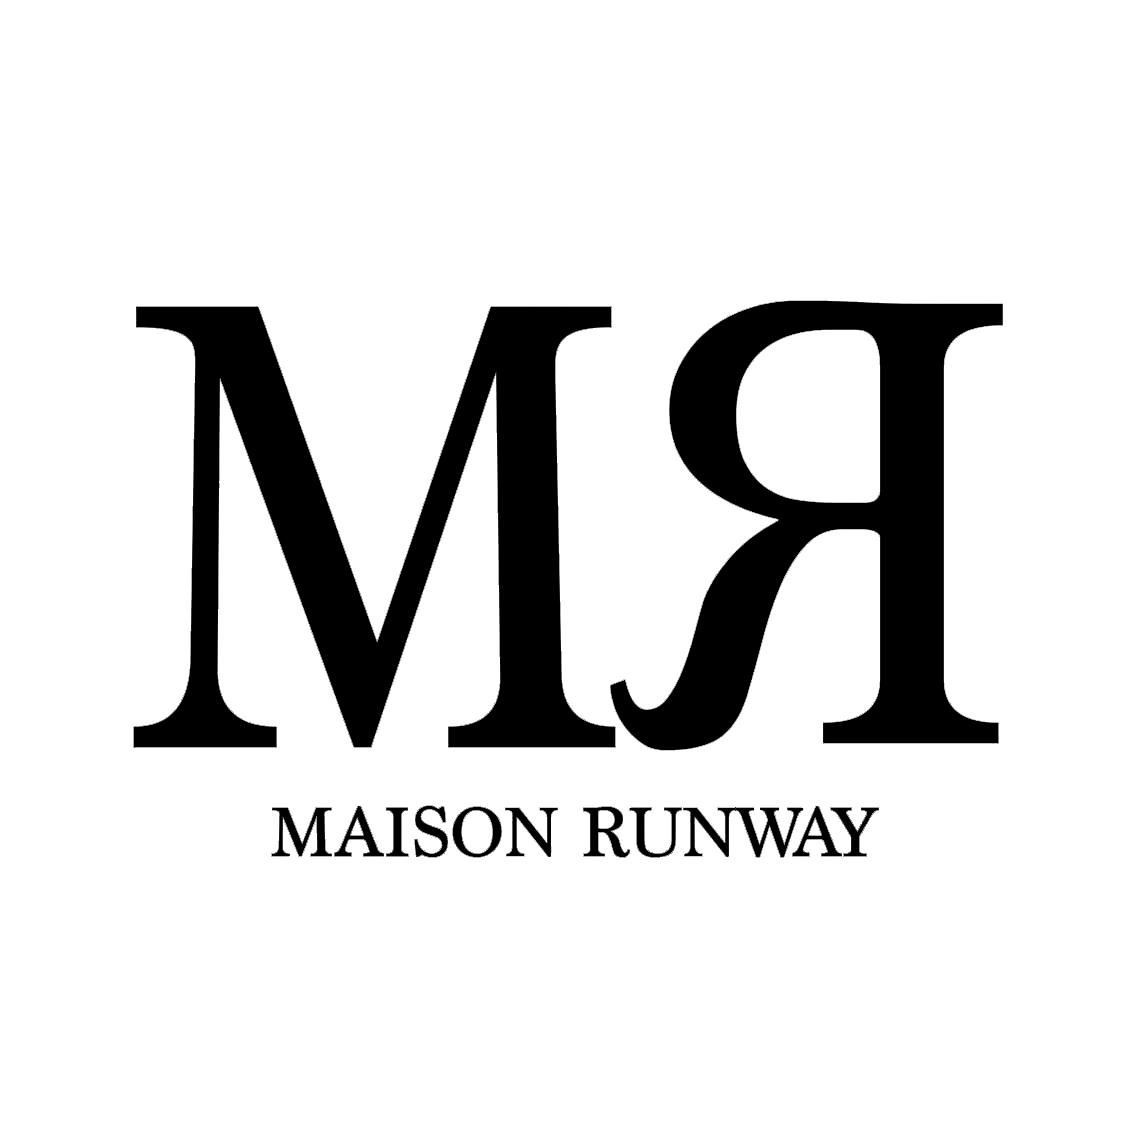 www.maisonrunway.com